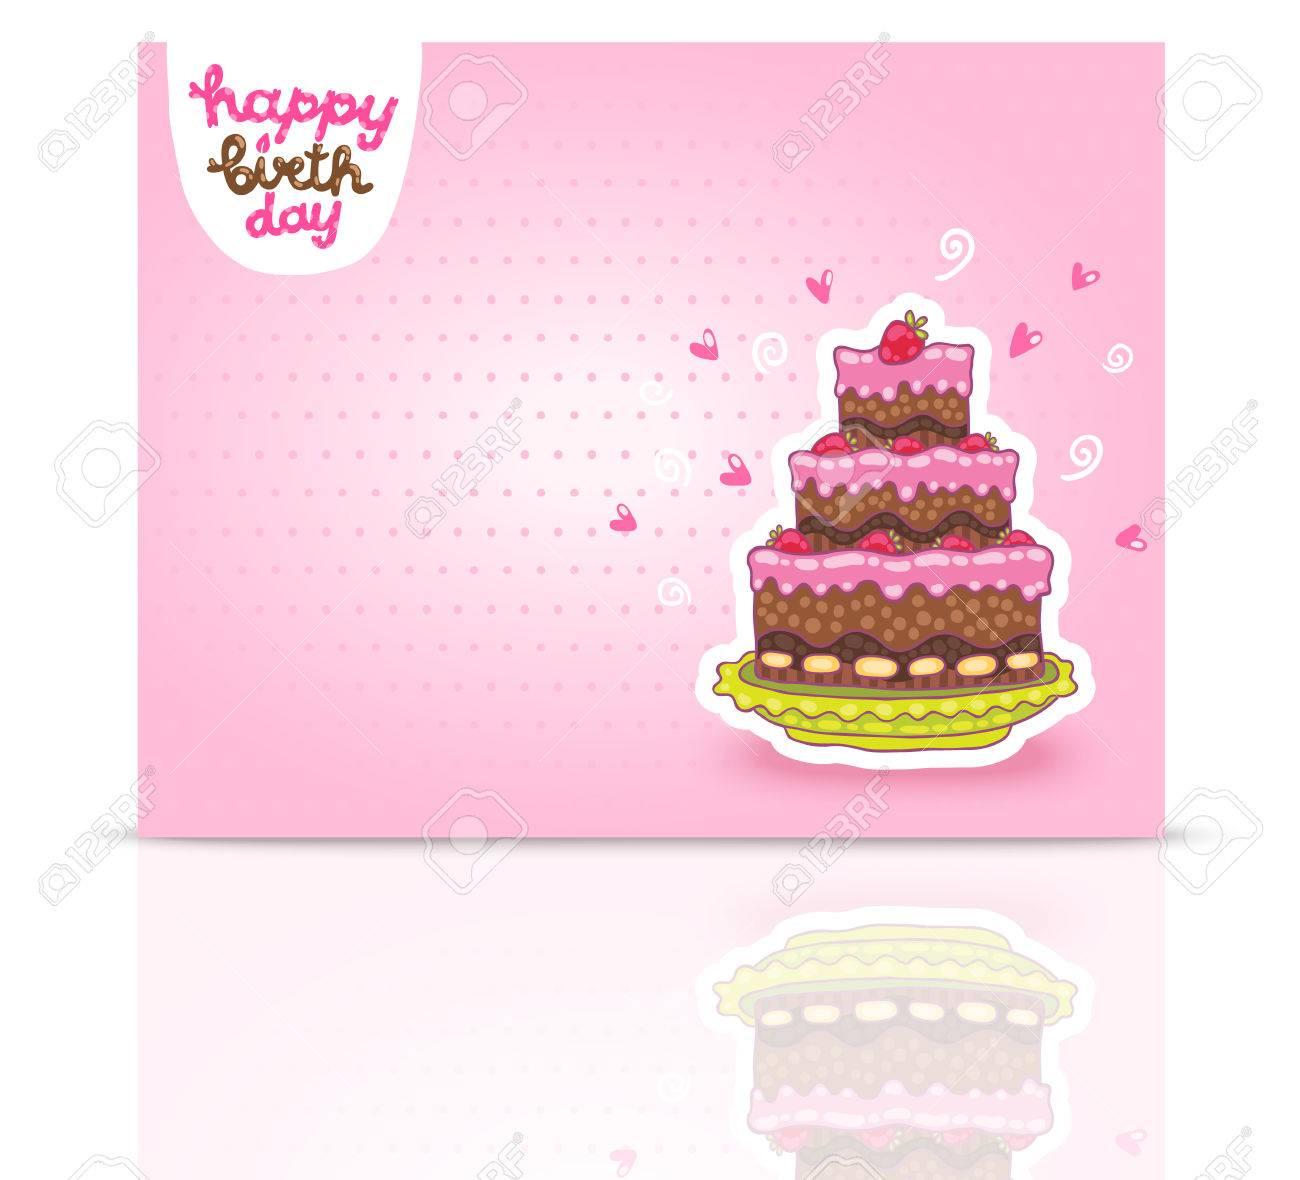 Birthday Cake Pop Up Card Images Free Birthday Cards Birthday Pop Up Card  Template Images Free Nice Ideas